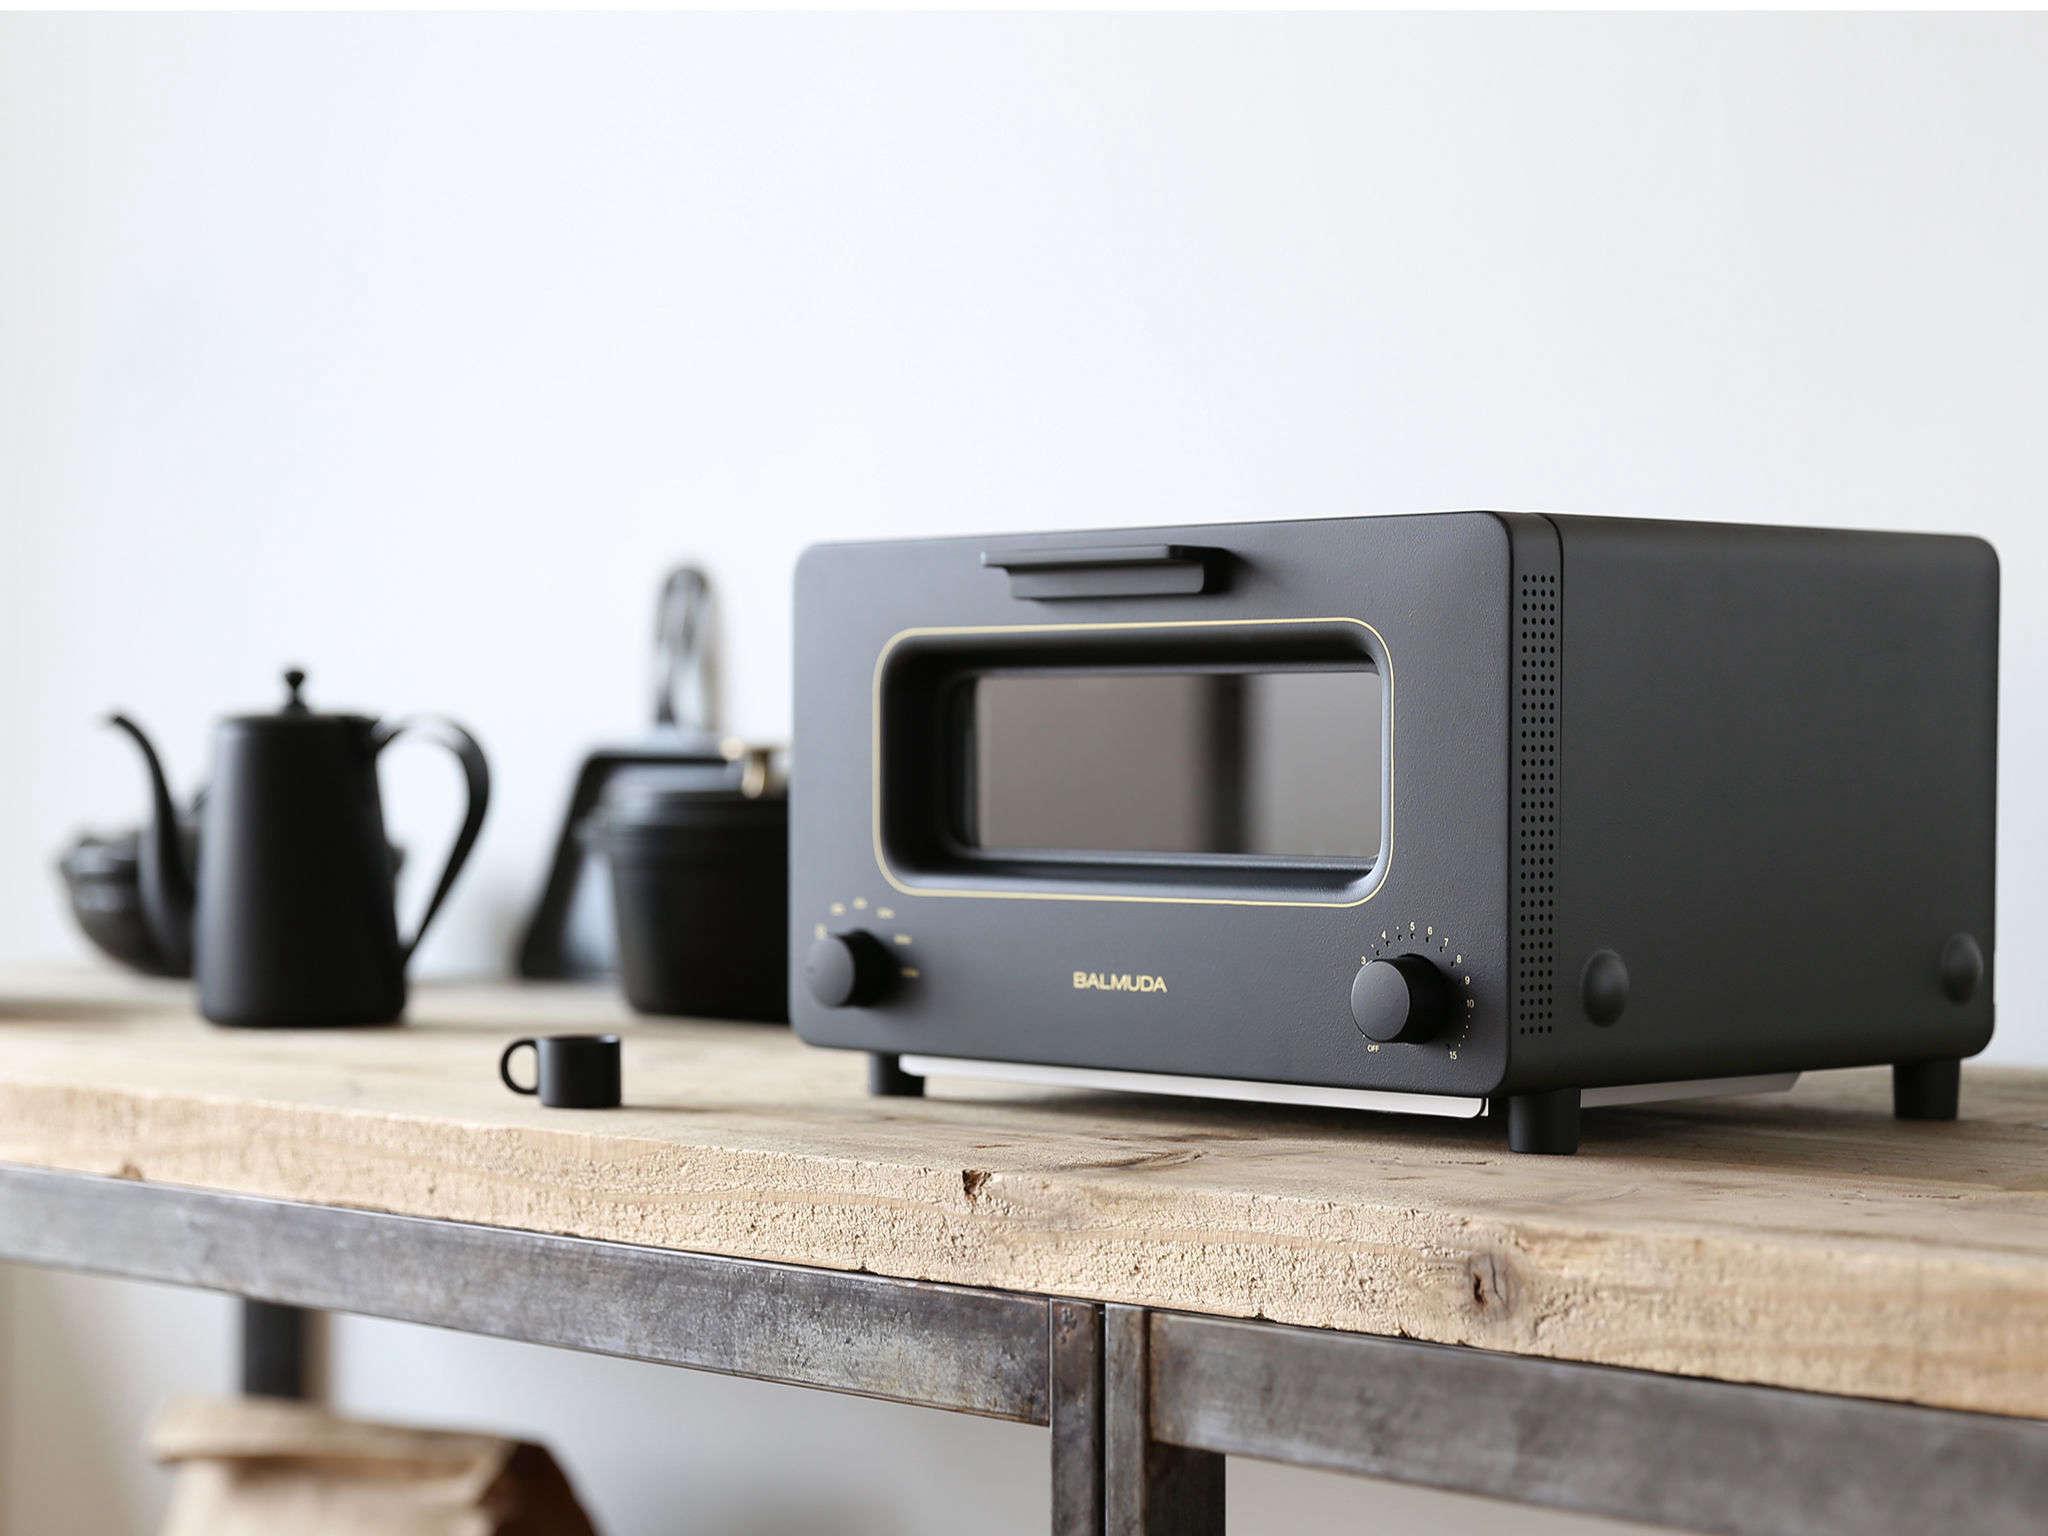 Balmuda Toaster Oven in Black